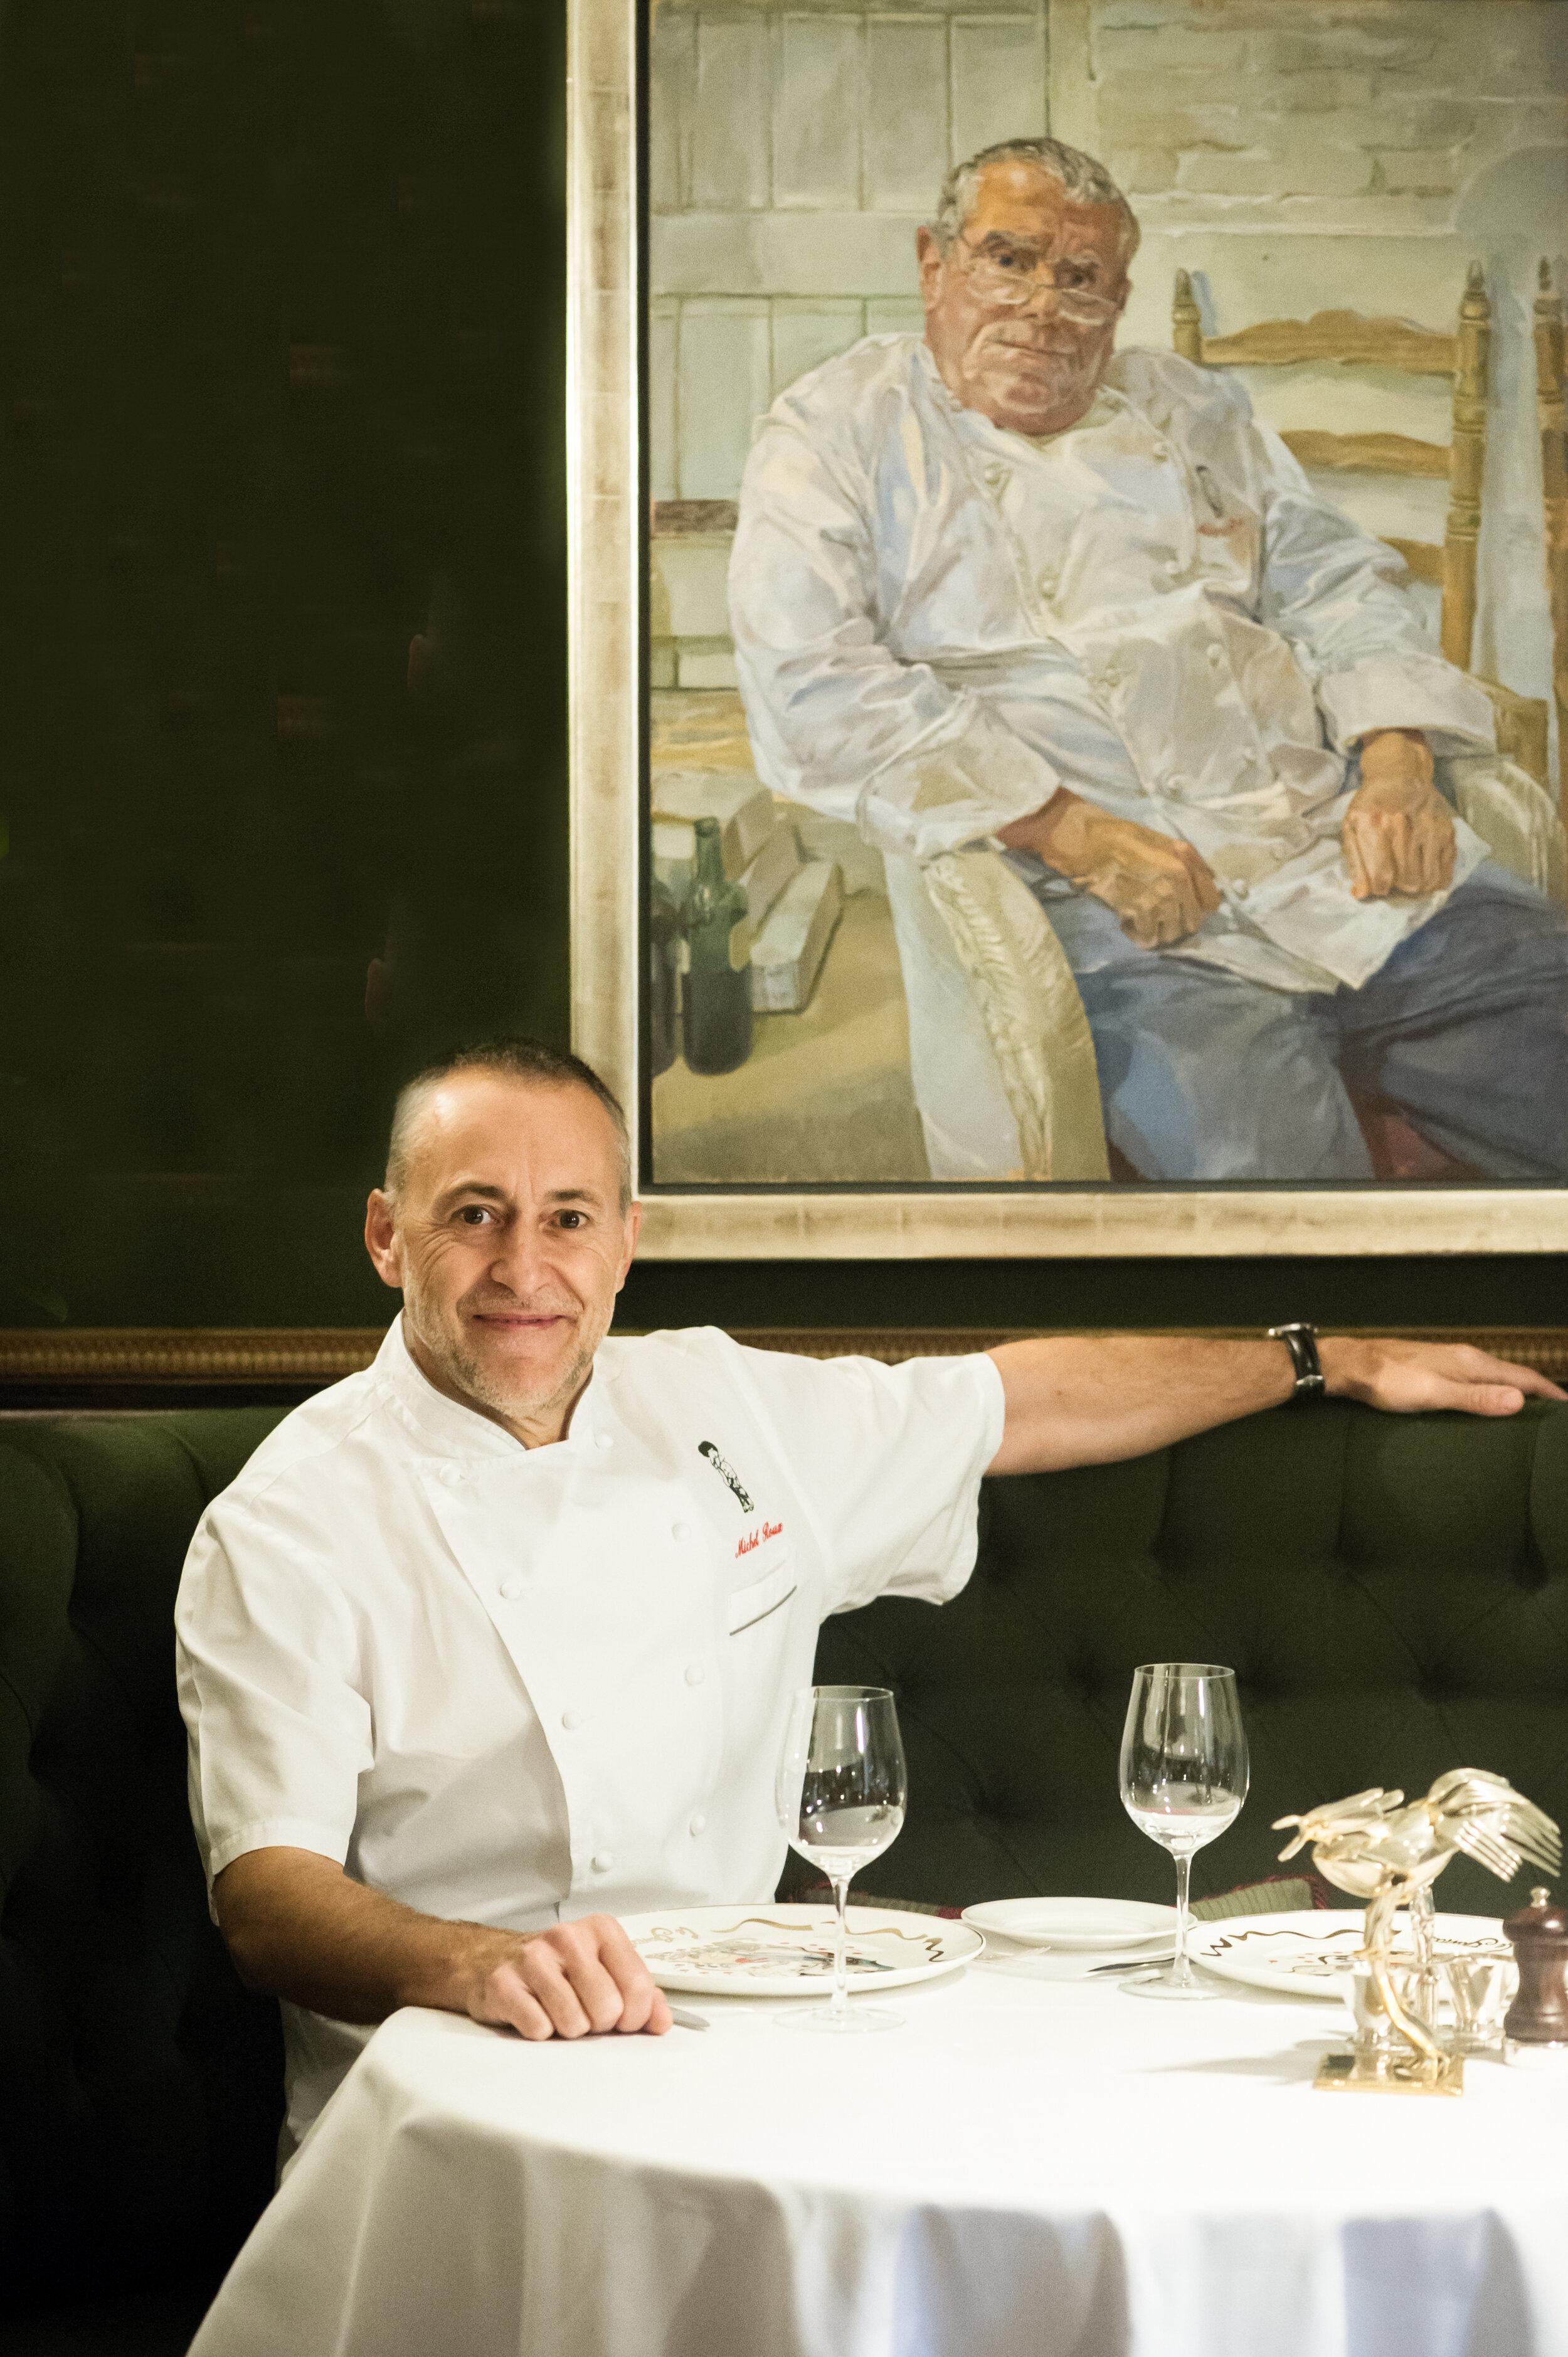 Le Gavroche - Michel Roux Jr's two Michelin-starred restaurant